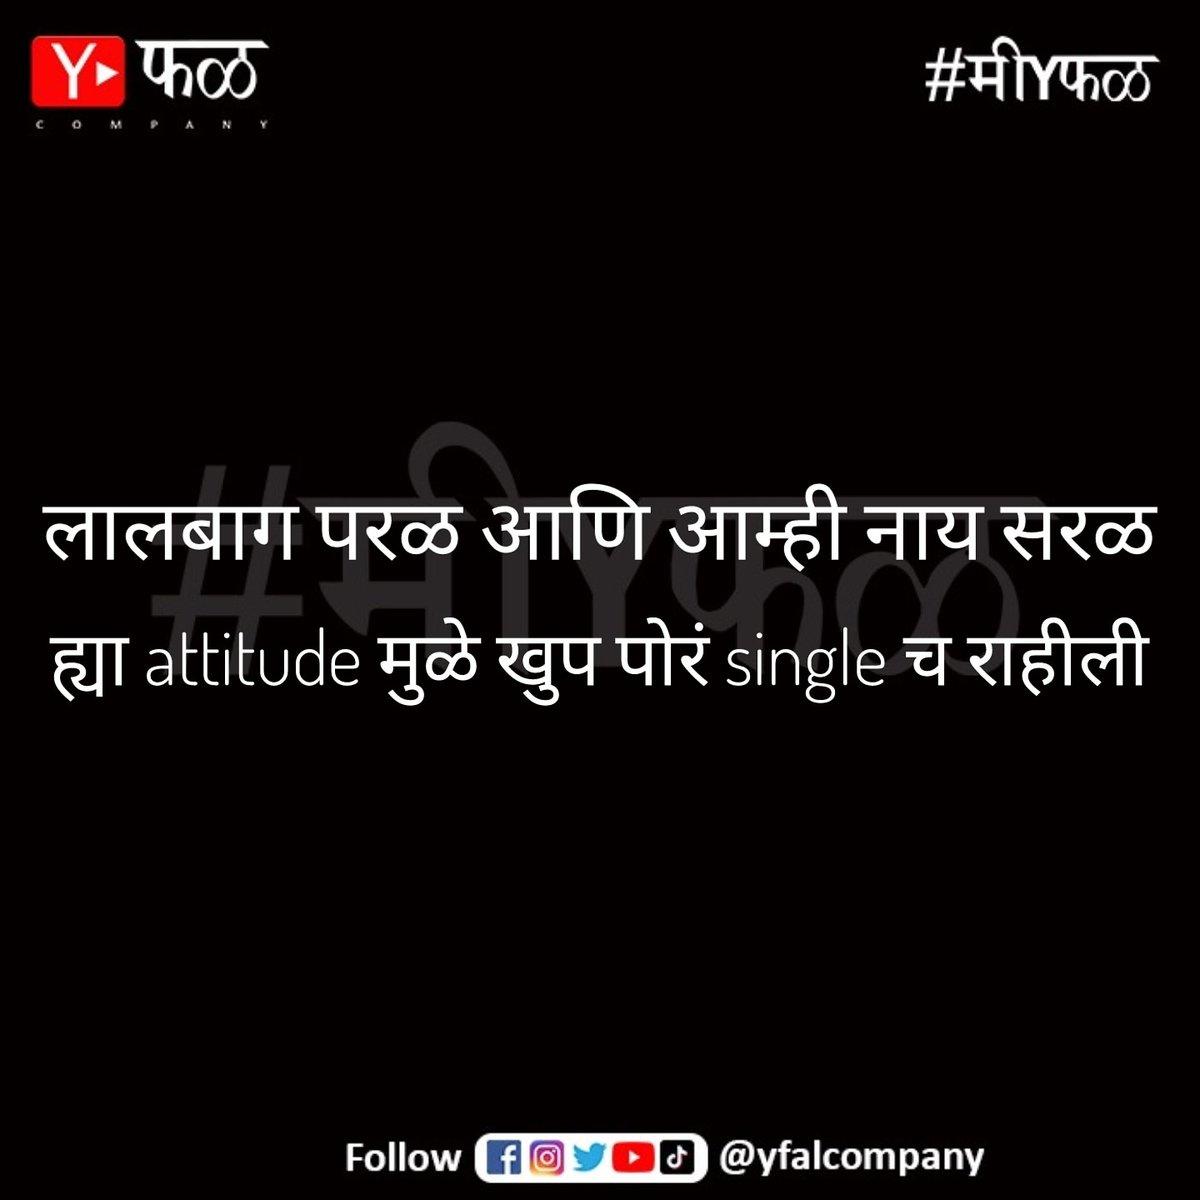 #मीYफळ #YFalCompany #Lalbaug #lalbaughcharaja #ganeshgalli #ganpati #ganpatibappamorya  #marathicomedy #MarathiMemes #marathiactors #maharashtramaza #maharashtra  #mumbai #mimarathi #मराठी #marathibana #bf #gf #couplegoals #covıd19 #lockdownlife #Lockdown #parelpic.twitter.com/Iehq70EEPH